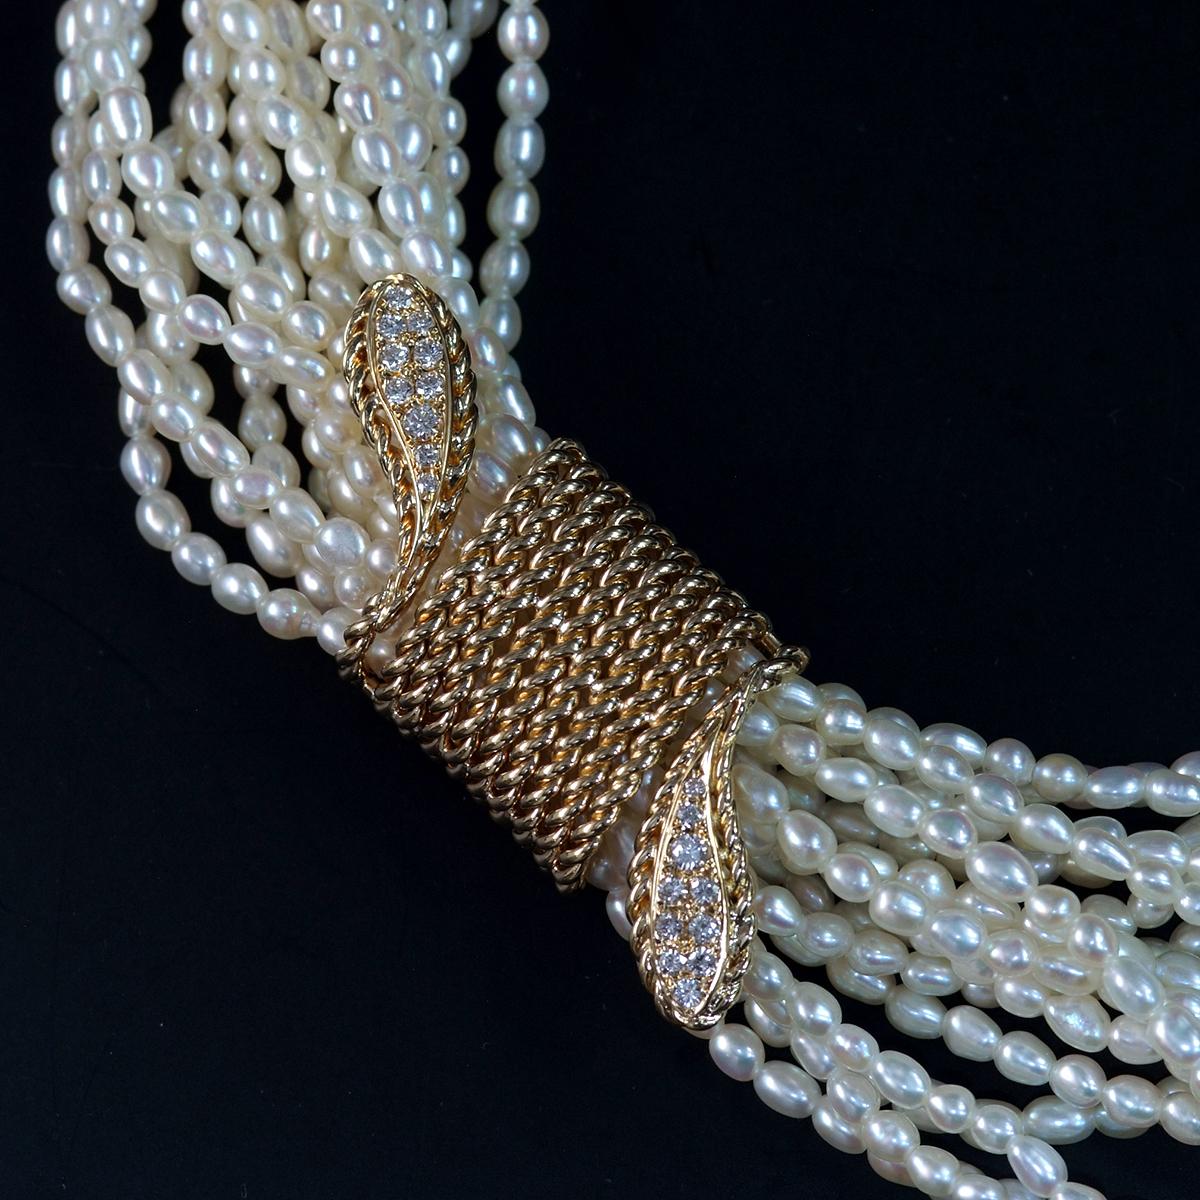 F0211【MIKIMOTO 1899】ミキモト パール 天然絶品ダイヤモンド0.33ct 最高級18金/14金無垢ネックレス 長さ42cm 重量87.5g 縦幅18.6mm_画像1